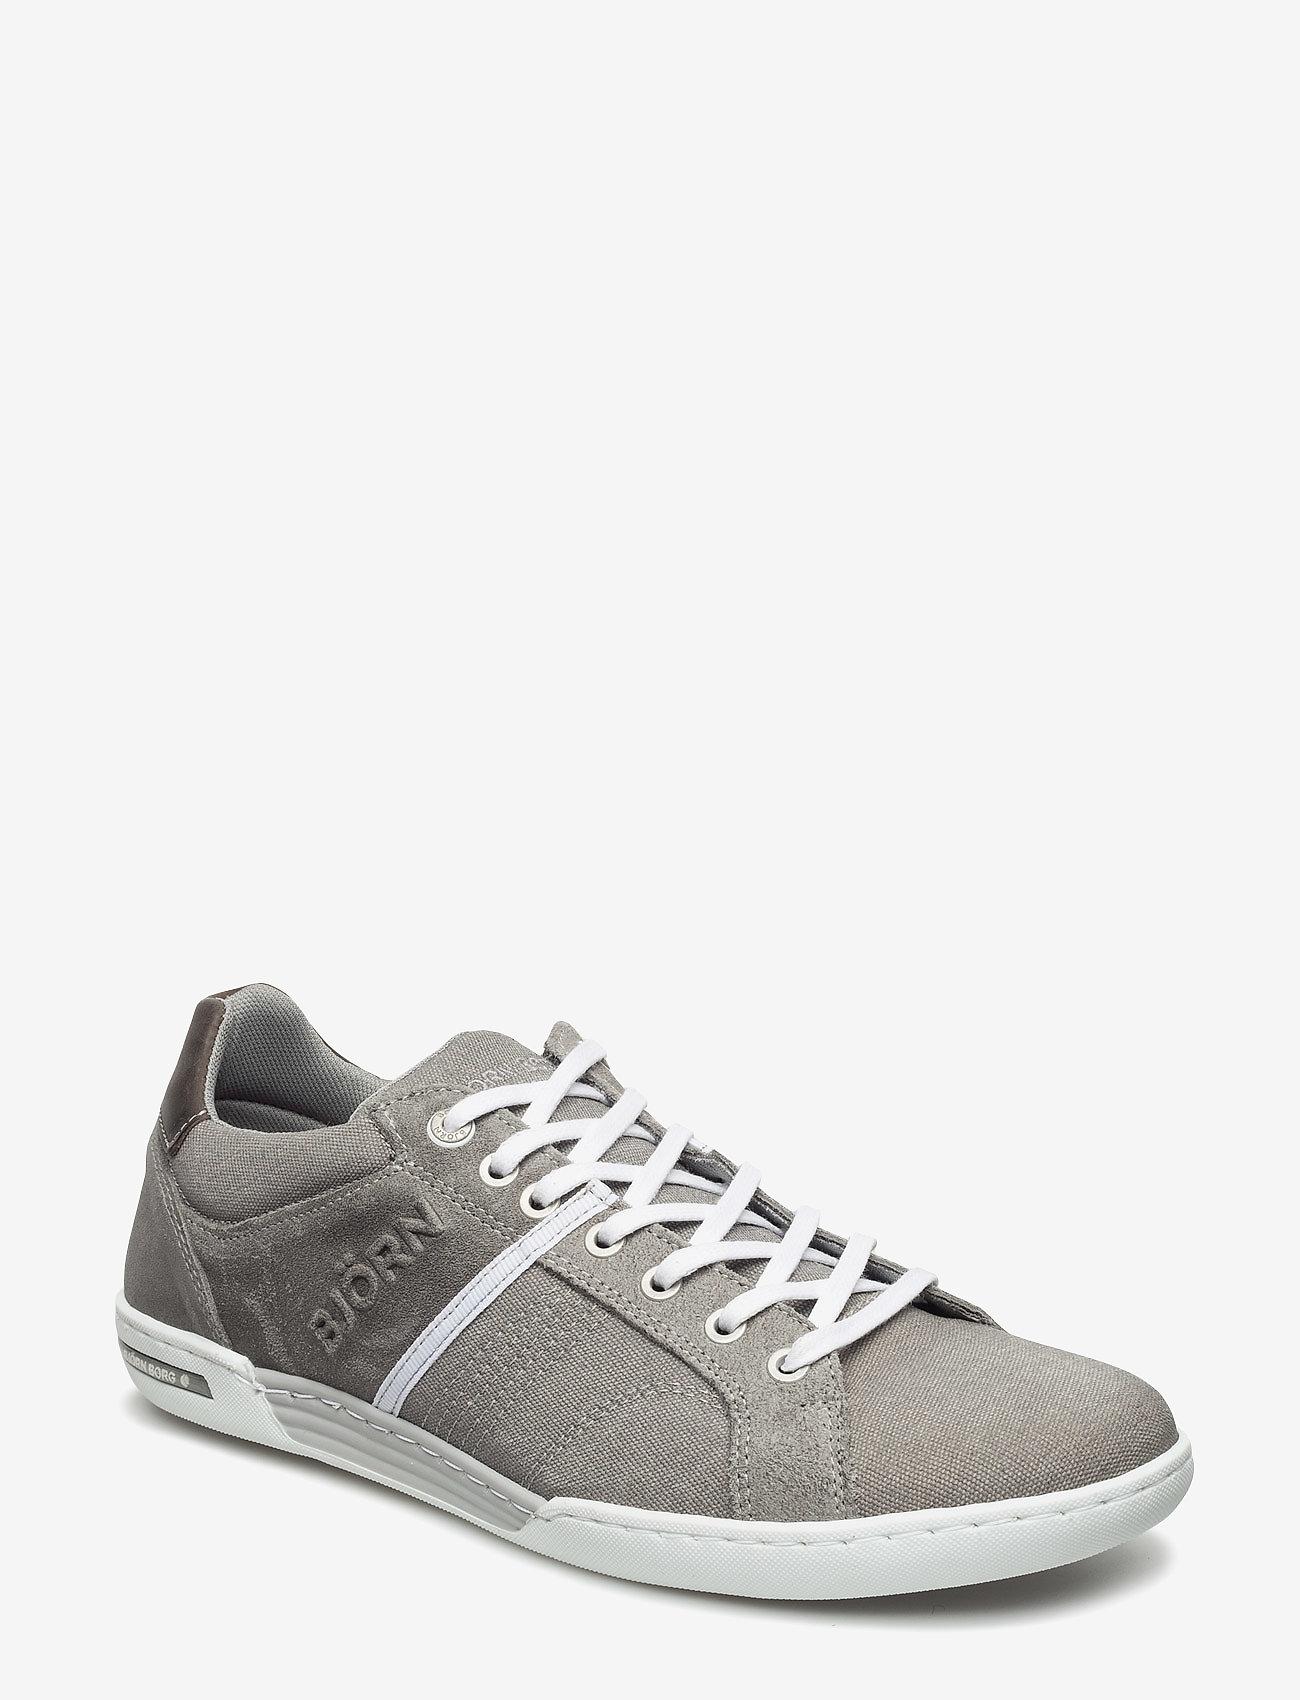 Björn Borg - Coltrane Cvs - laag sneakers - lt grey-dk grey - 0